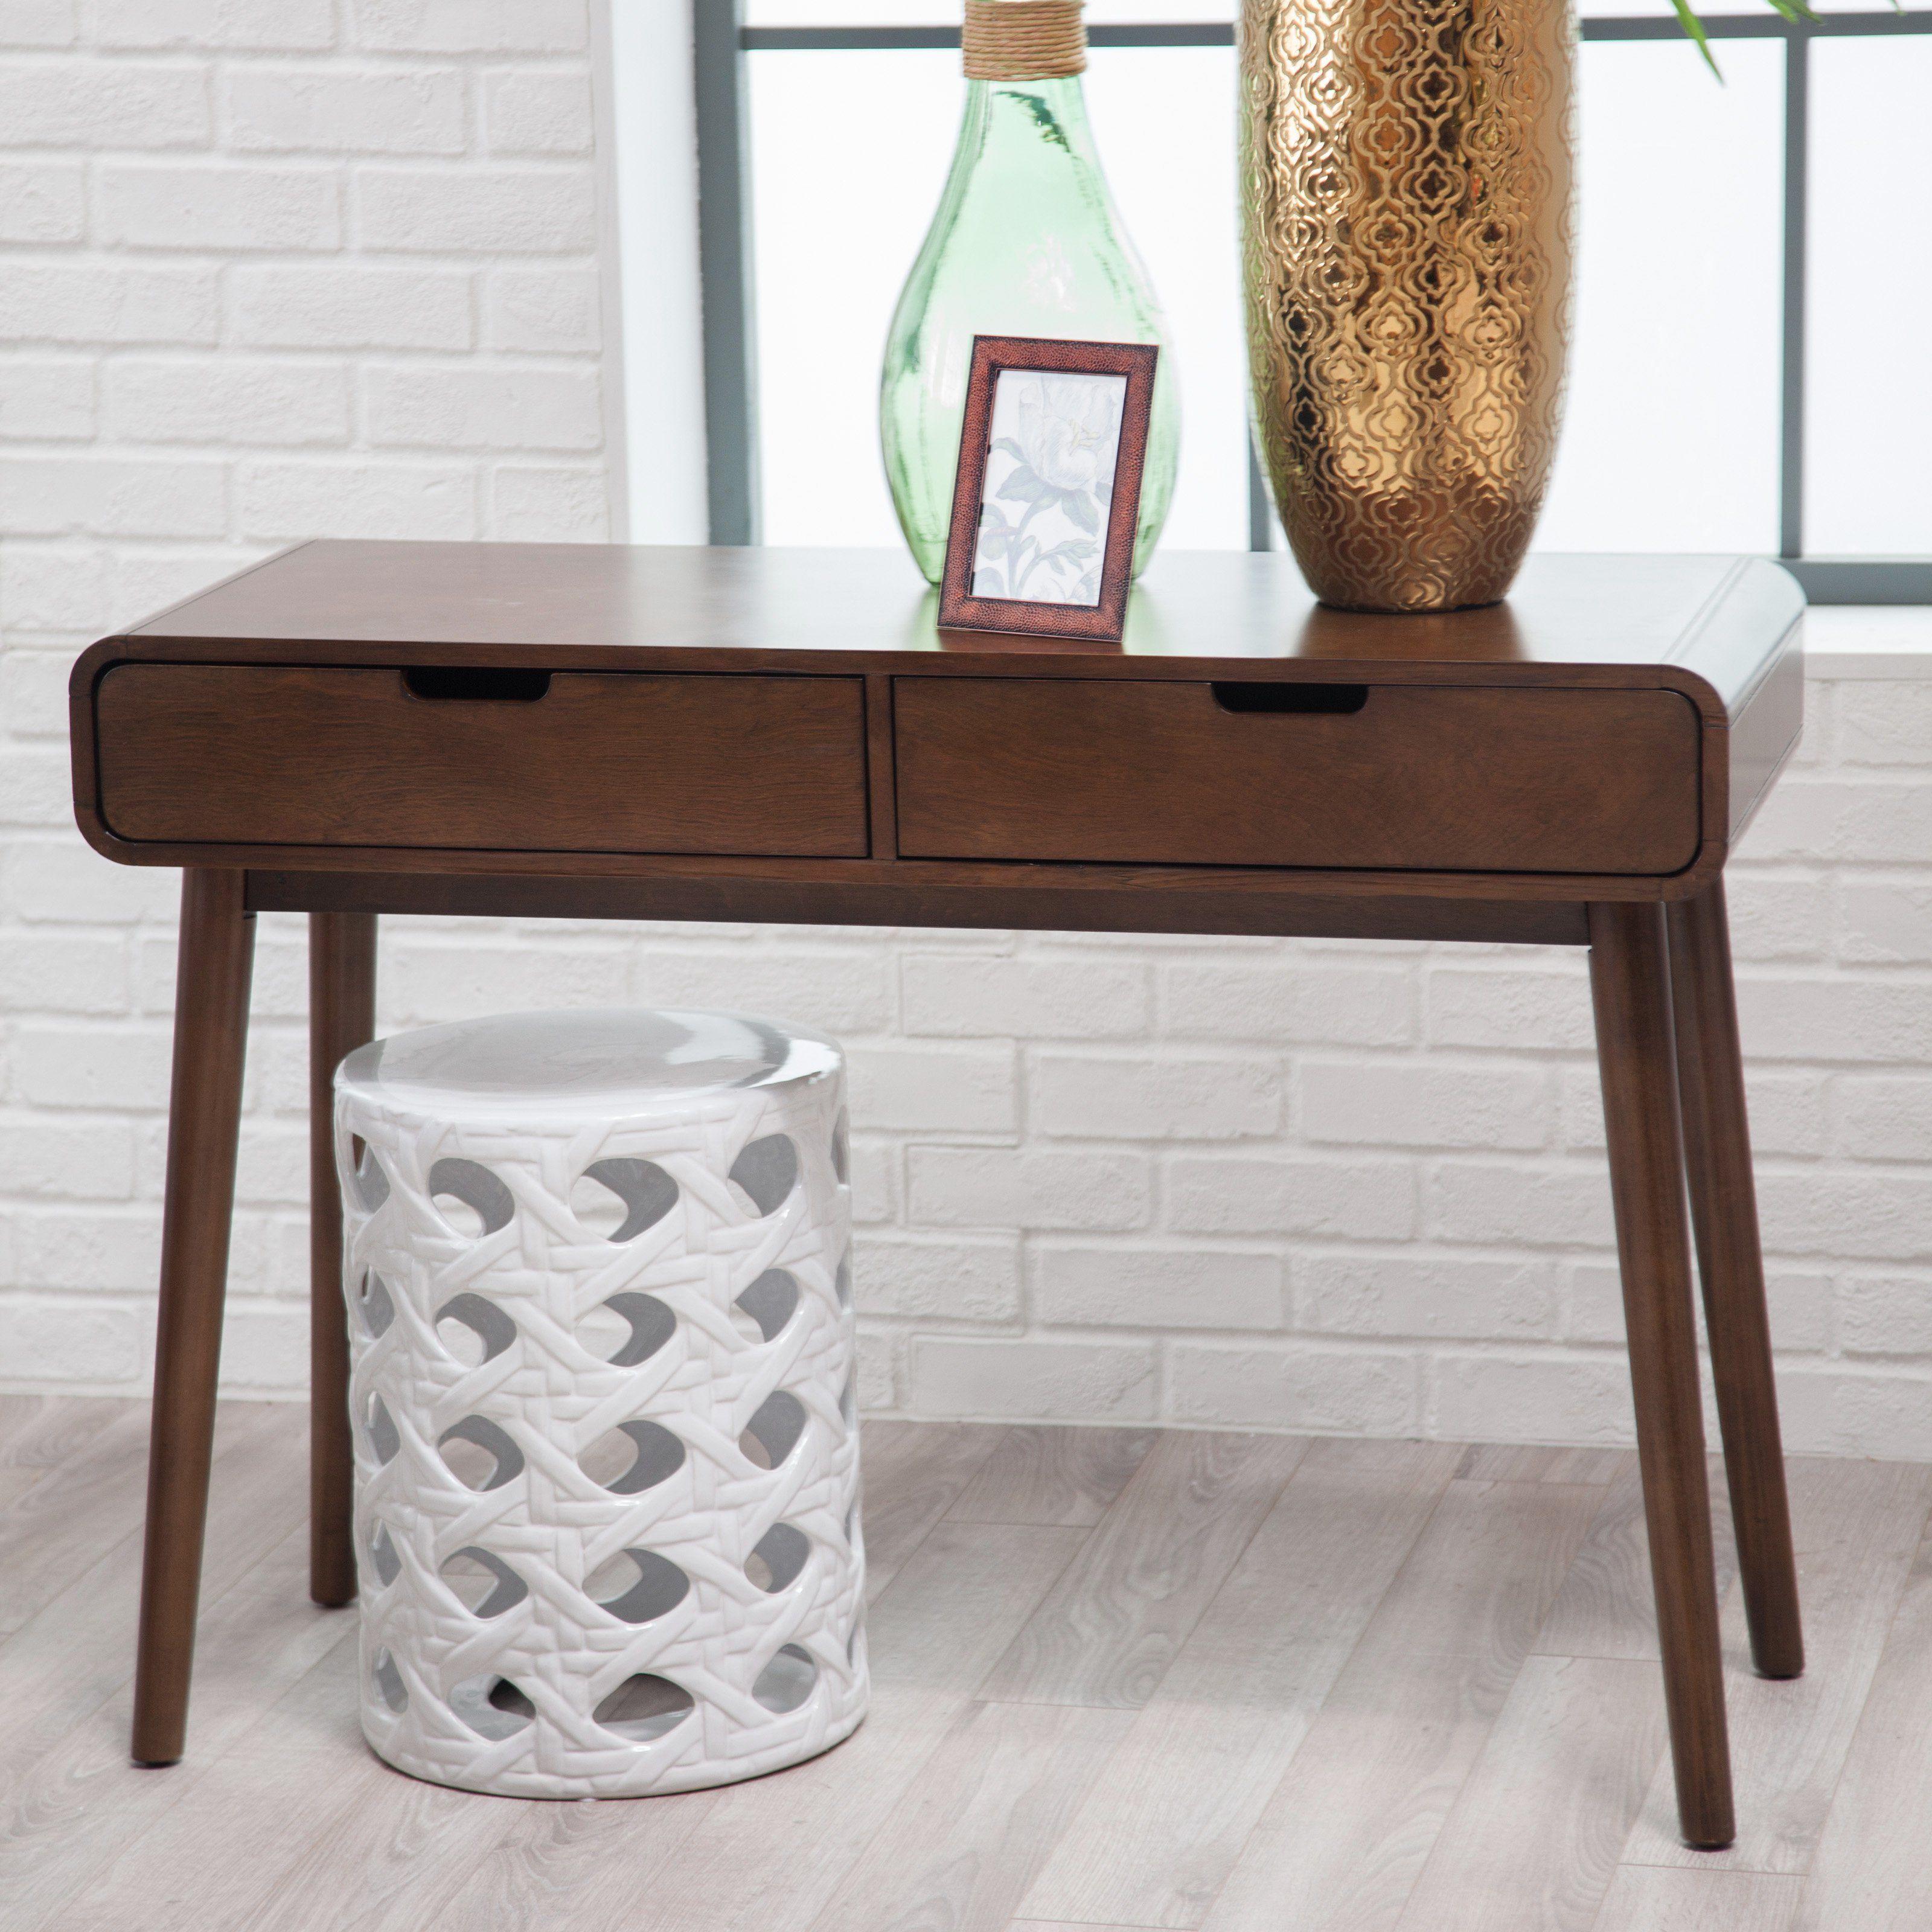 Groovy Belham Living Carter Mid Century Modern Console Table Gamerscity Chair Design For Home Gamerscityorg